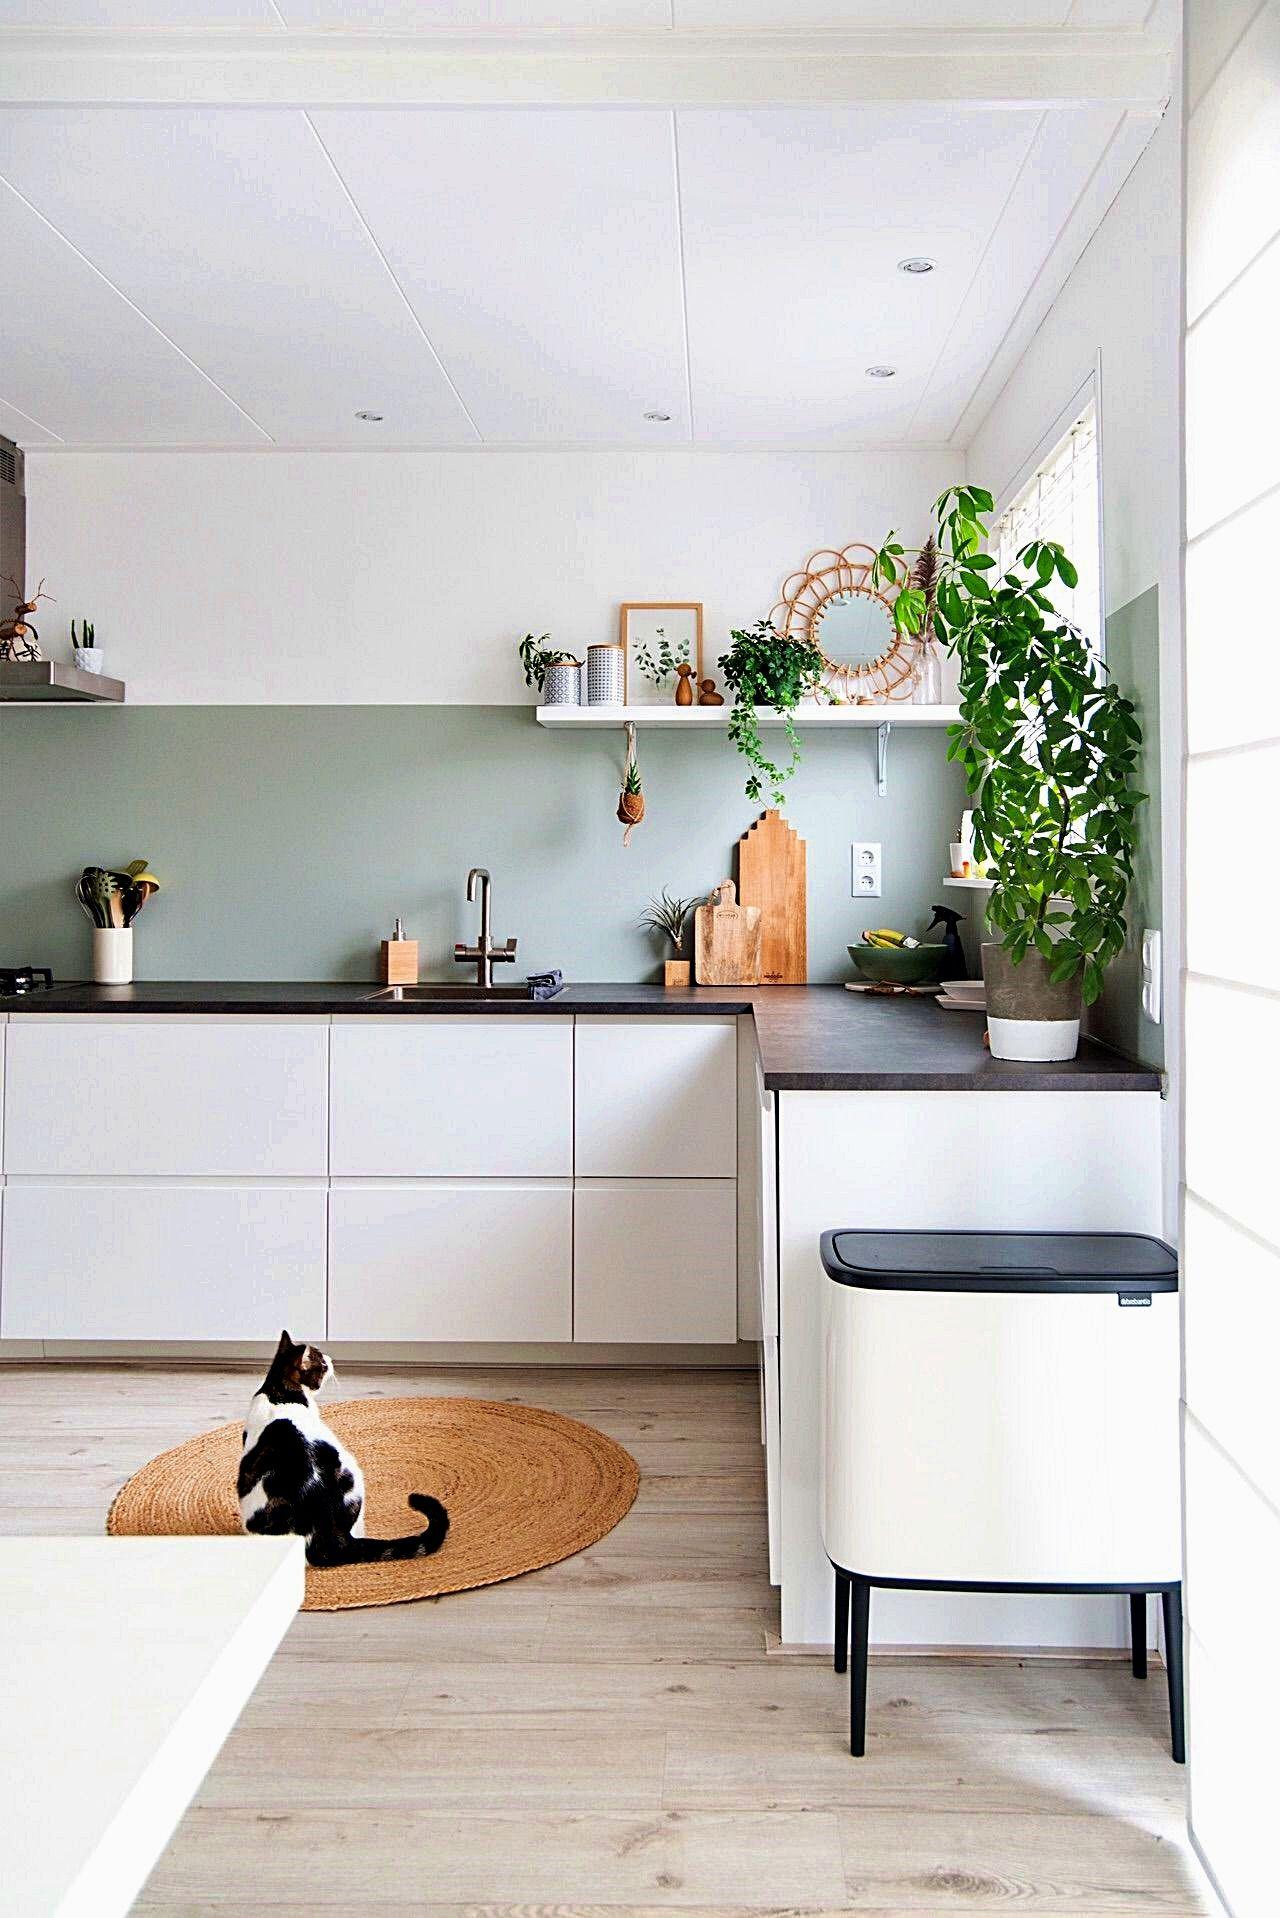 40 Sleek Black Kitchen Ideas And Cabinets (2020 Photos